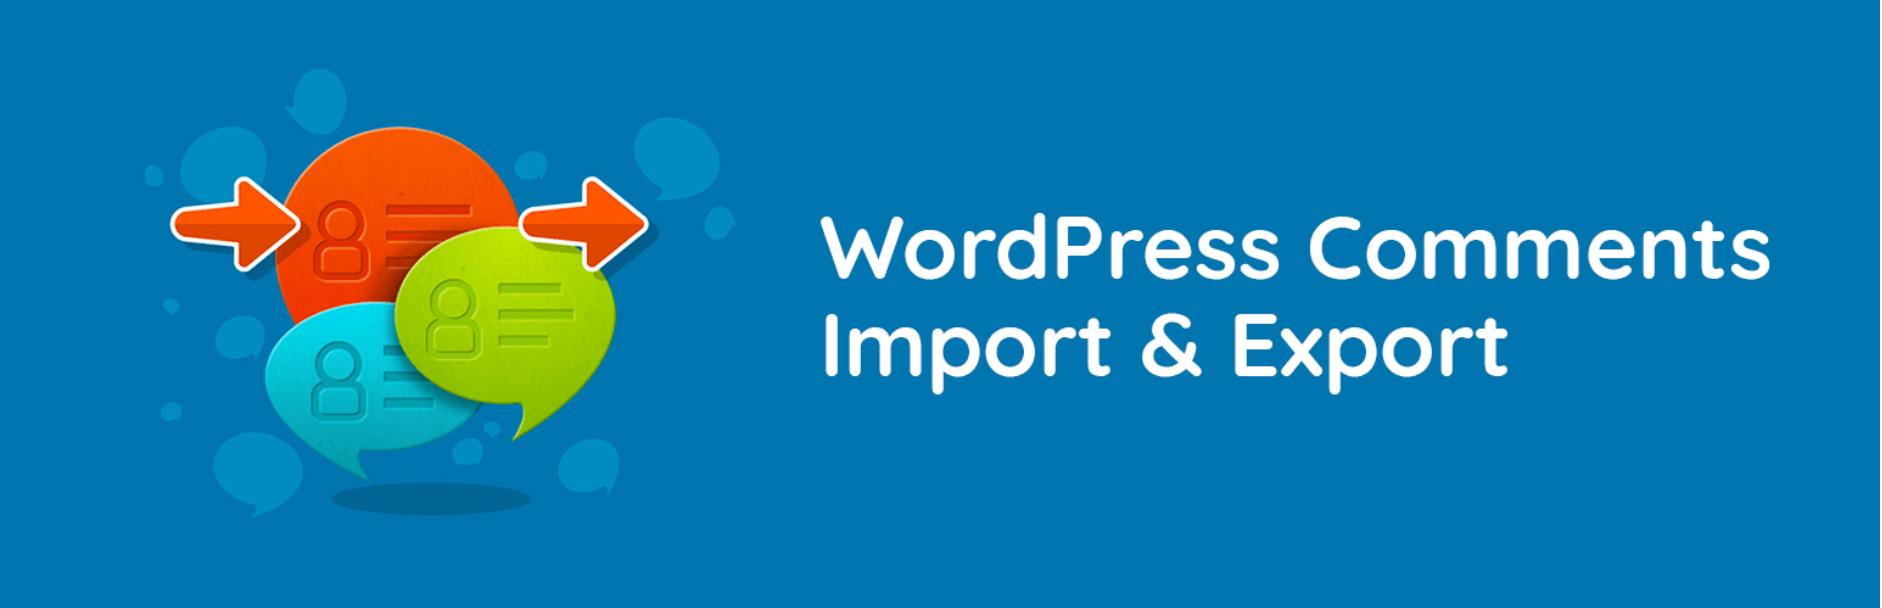 WordPress Comments Import & Export